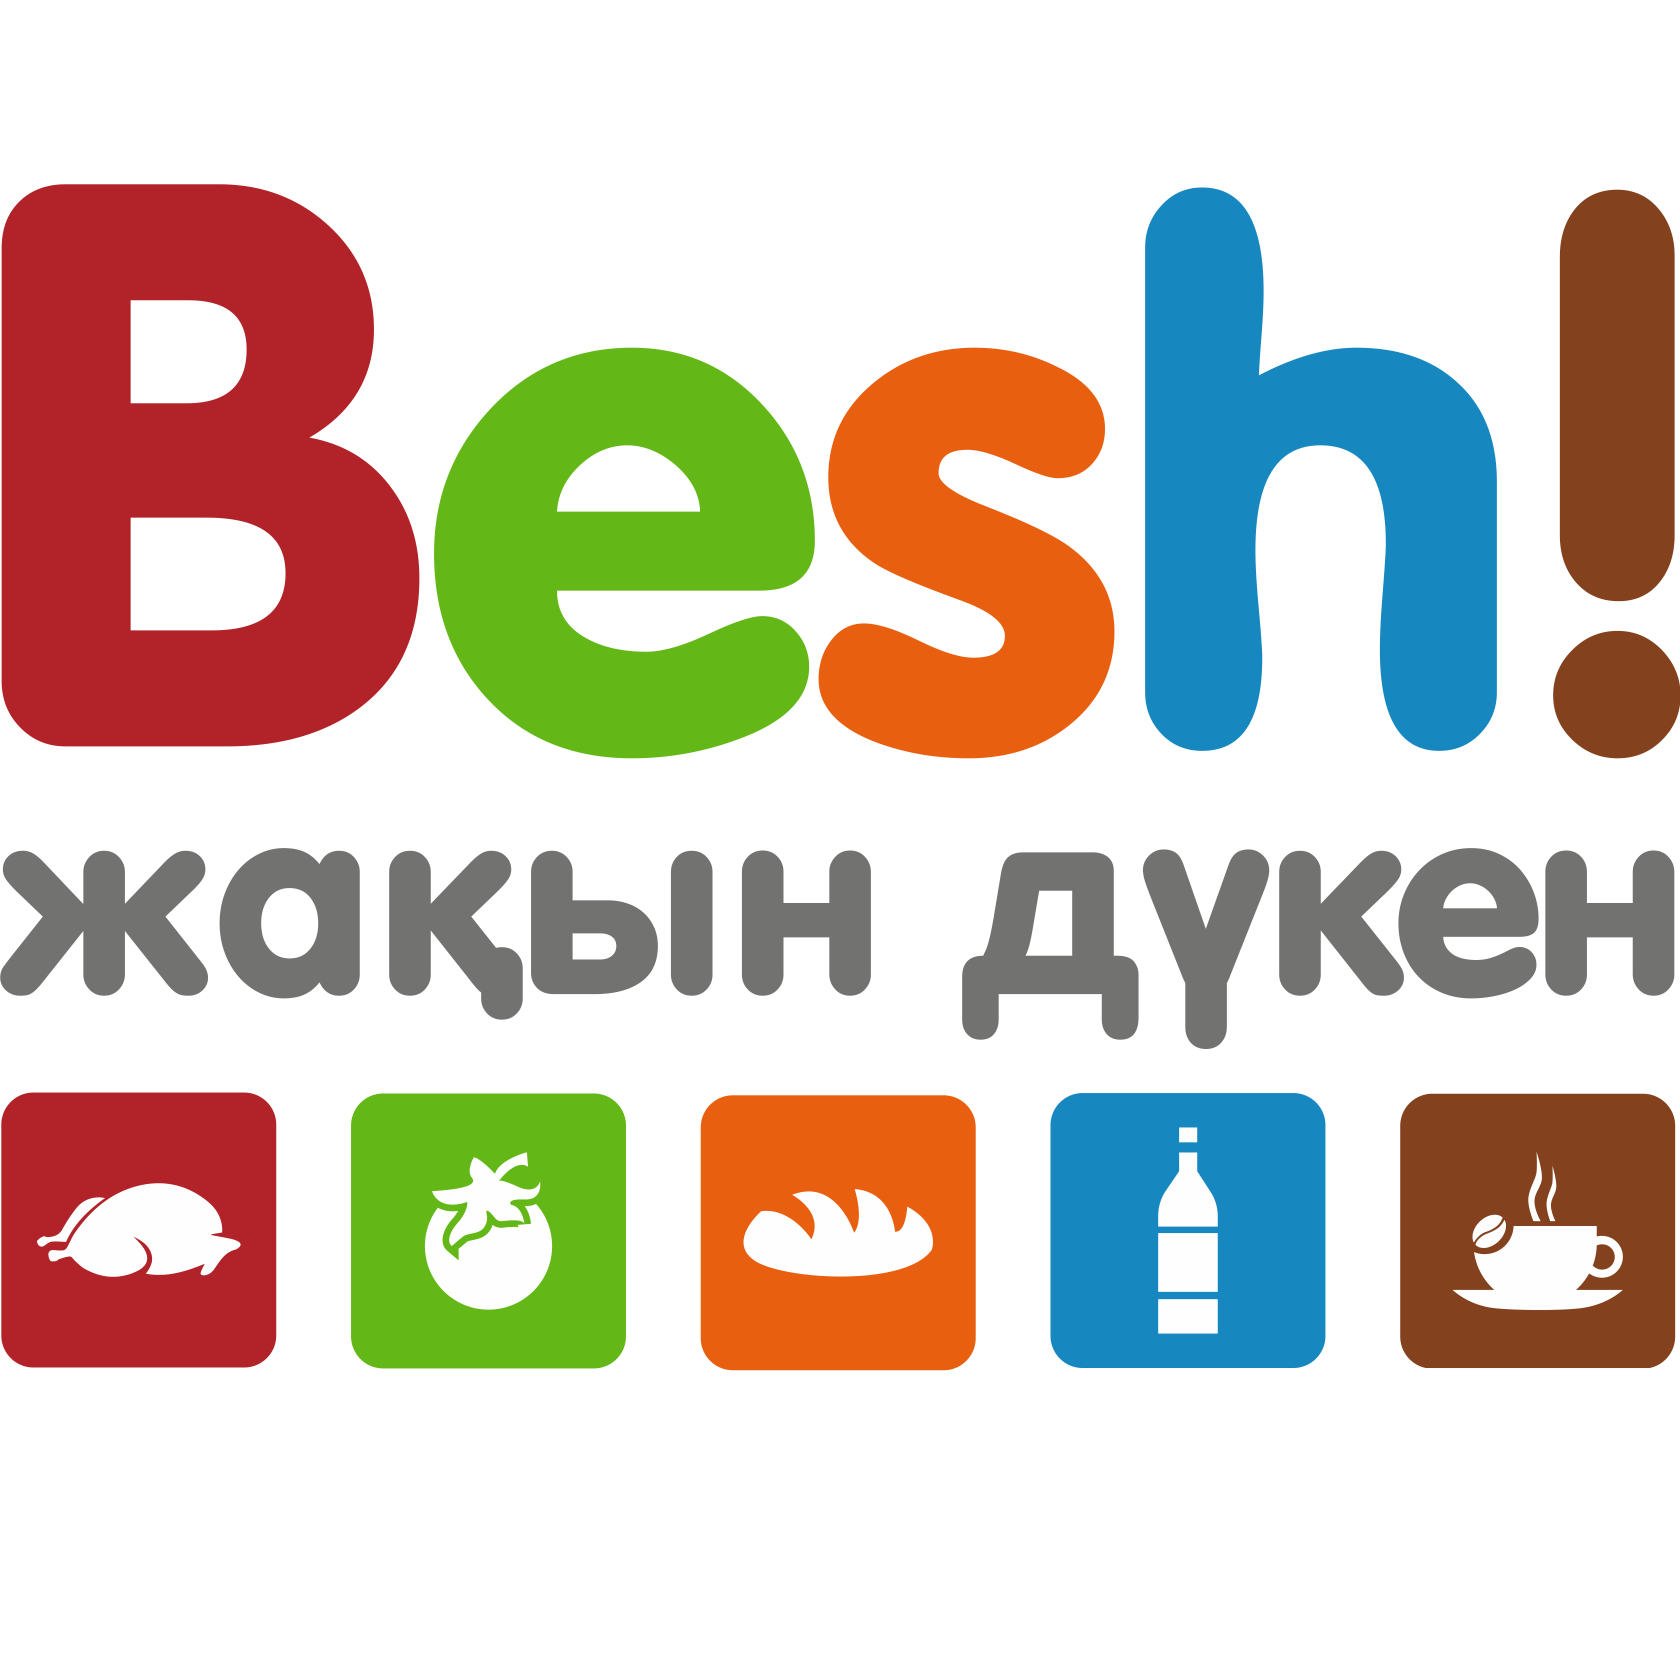 Besh: Logo